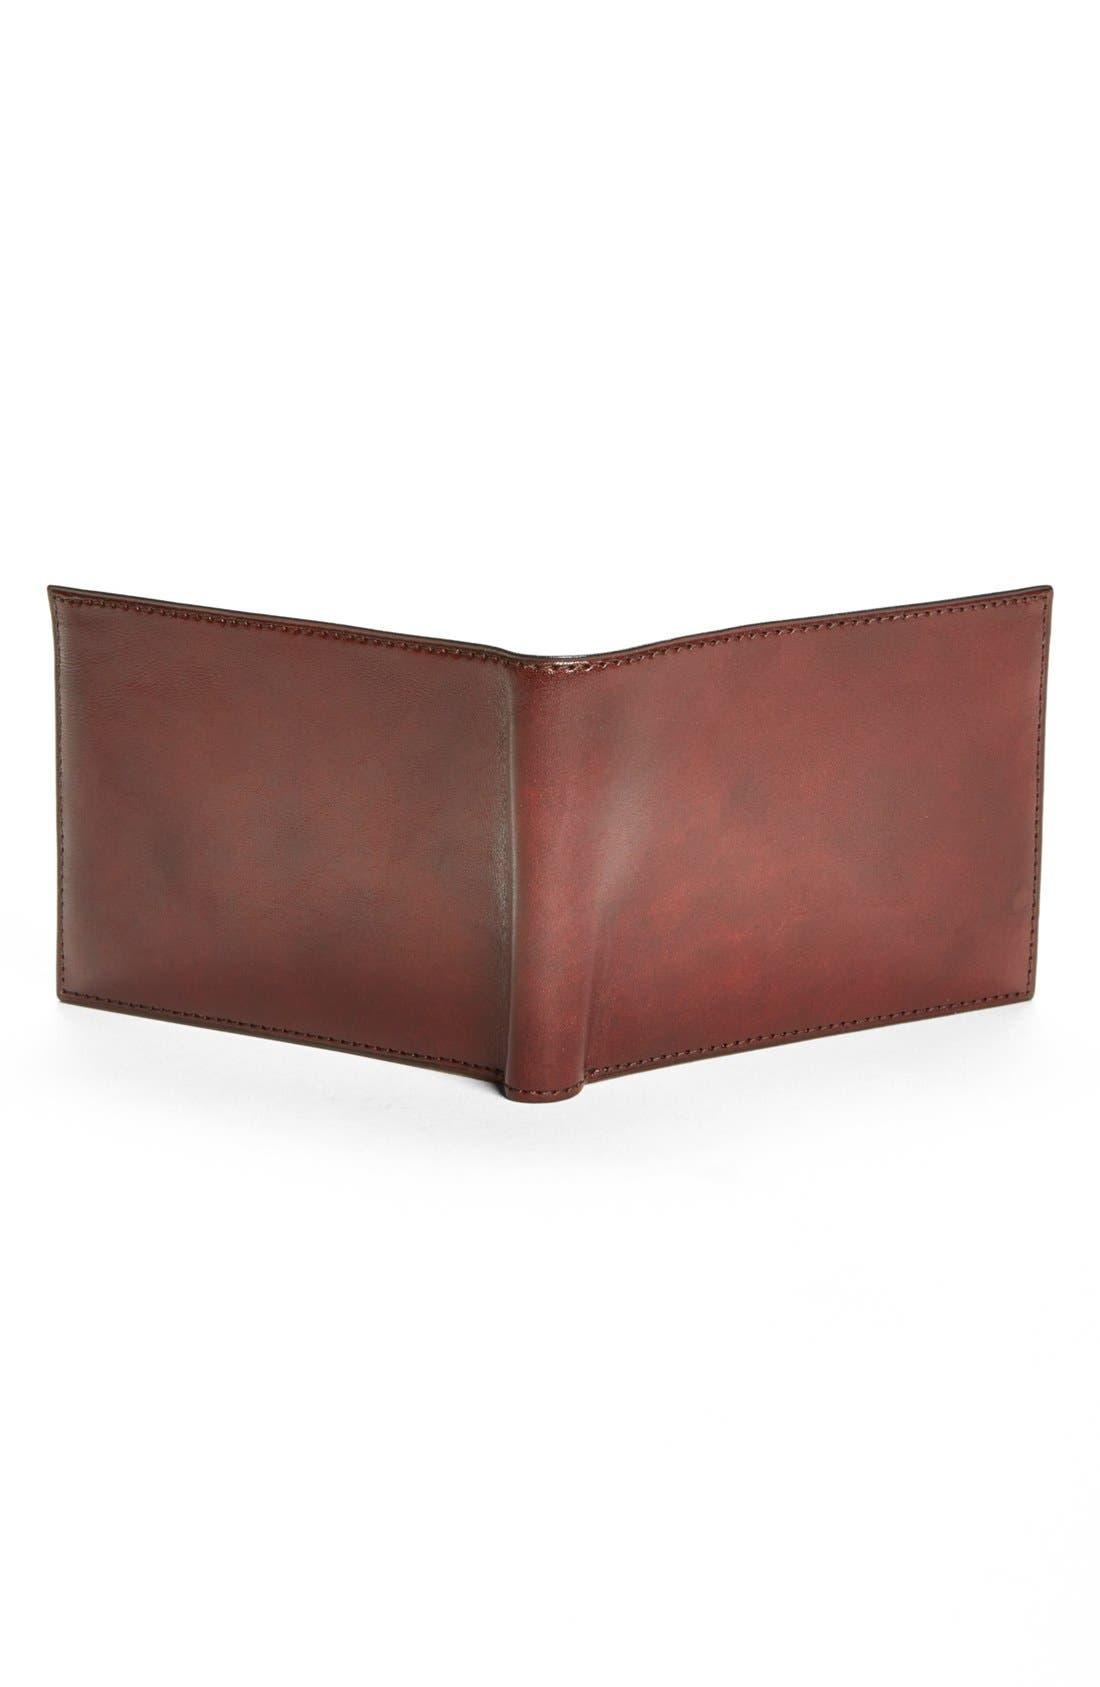 Alternate Image 3  - Bosca ID Passcase Wallet